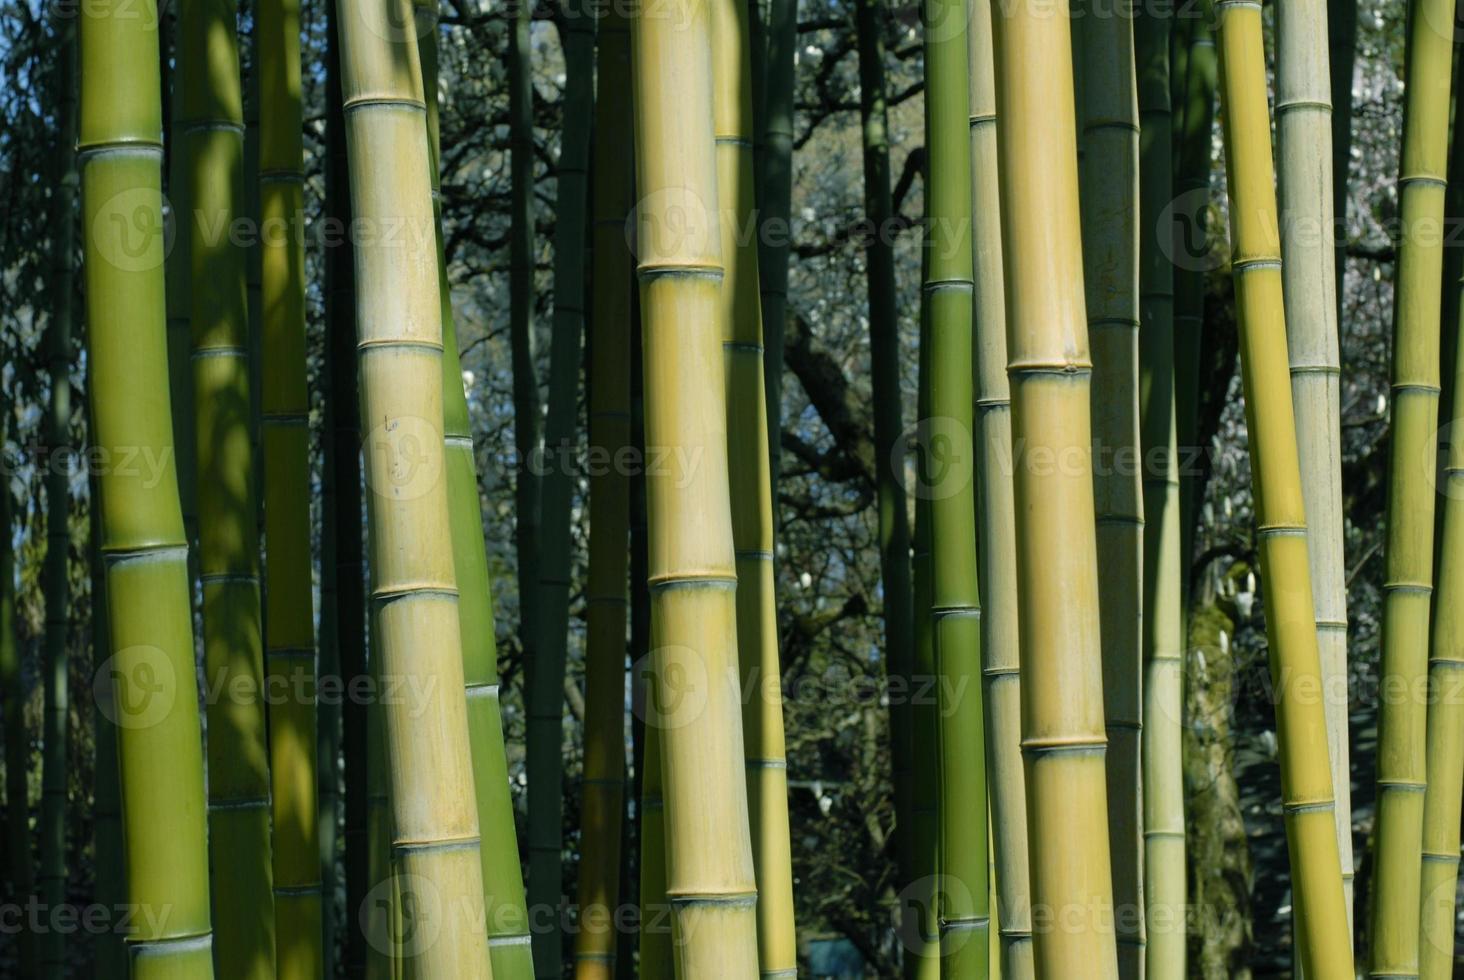 pousses de bambou photo